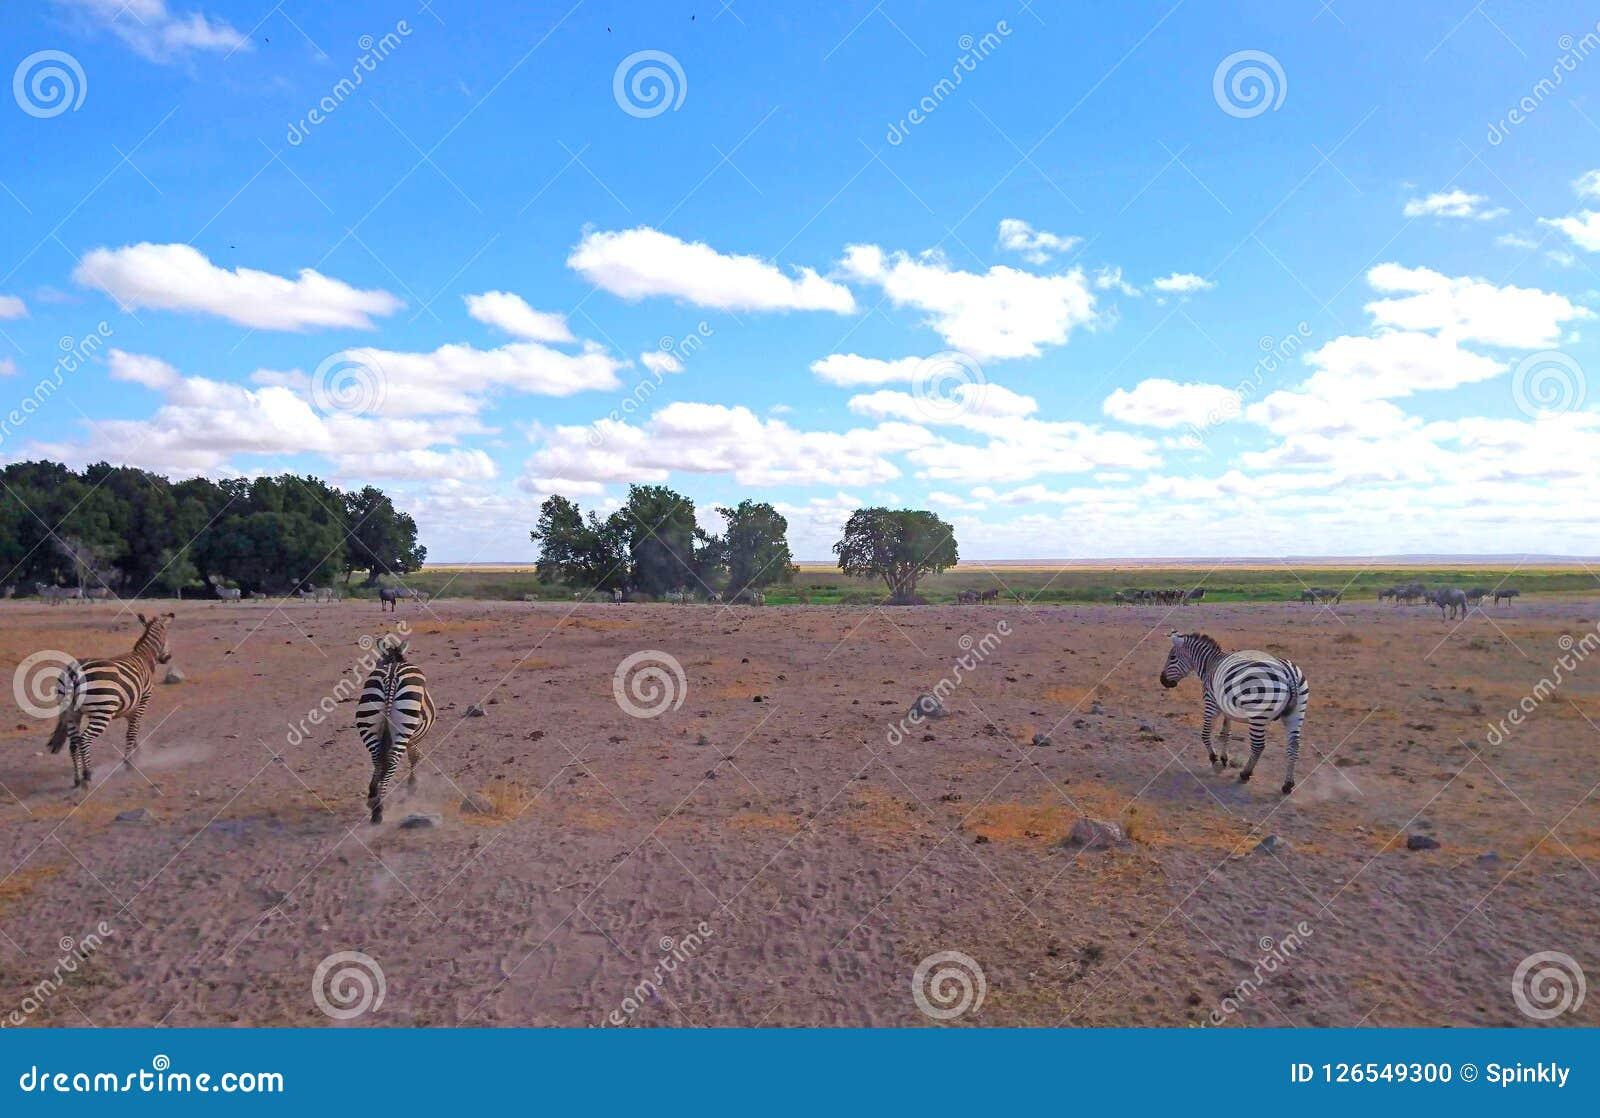 Landscape image with zebras for background